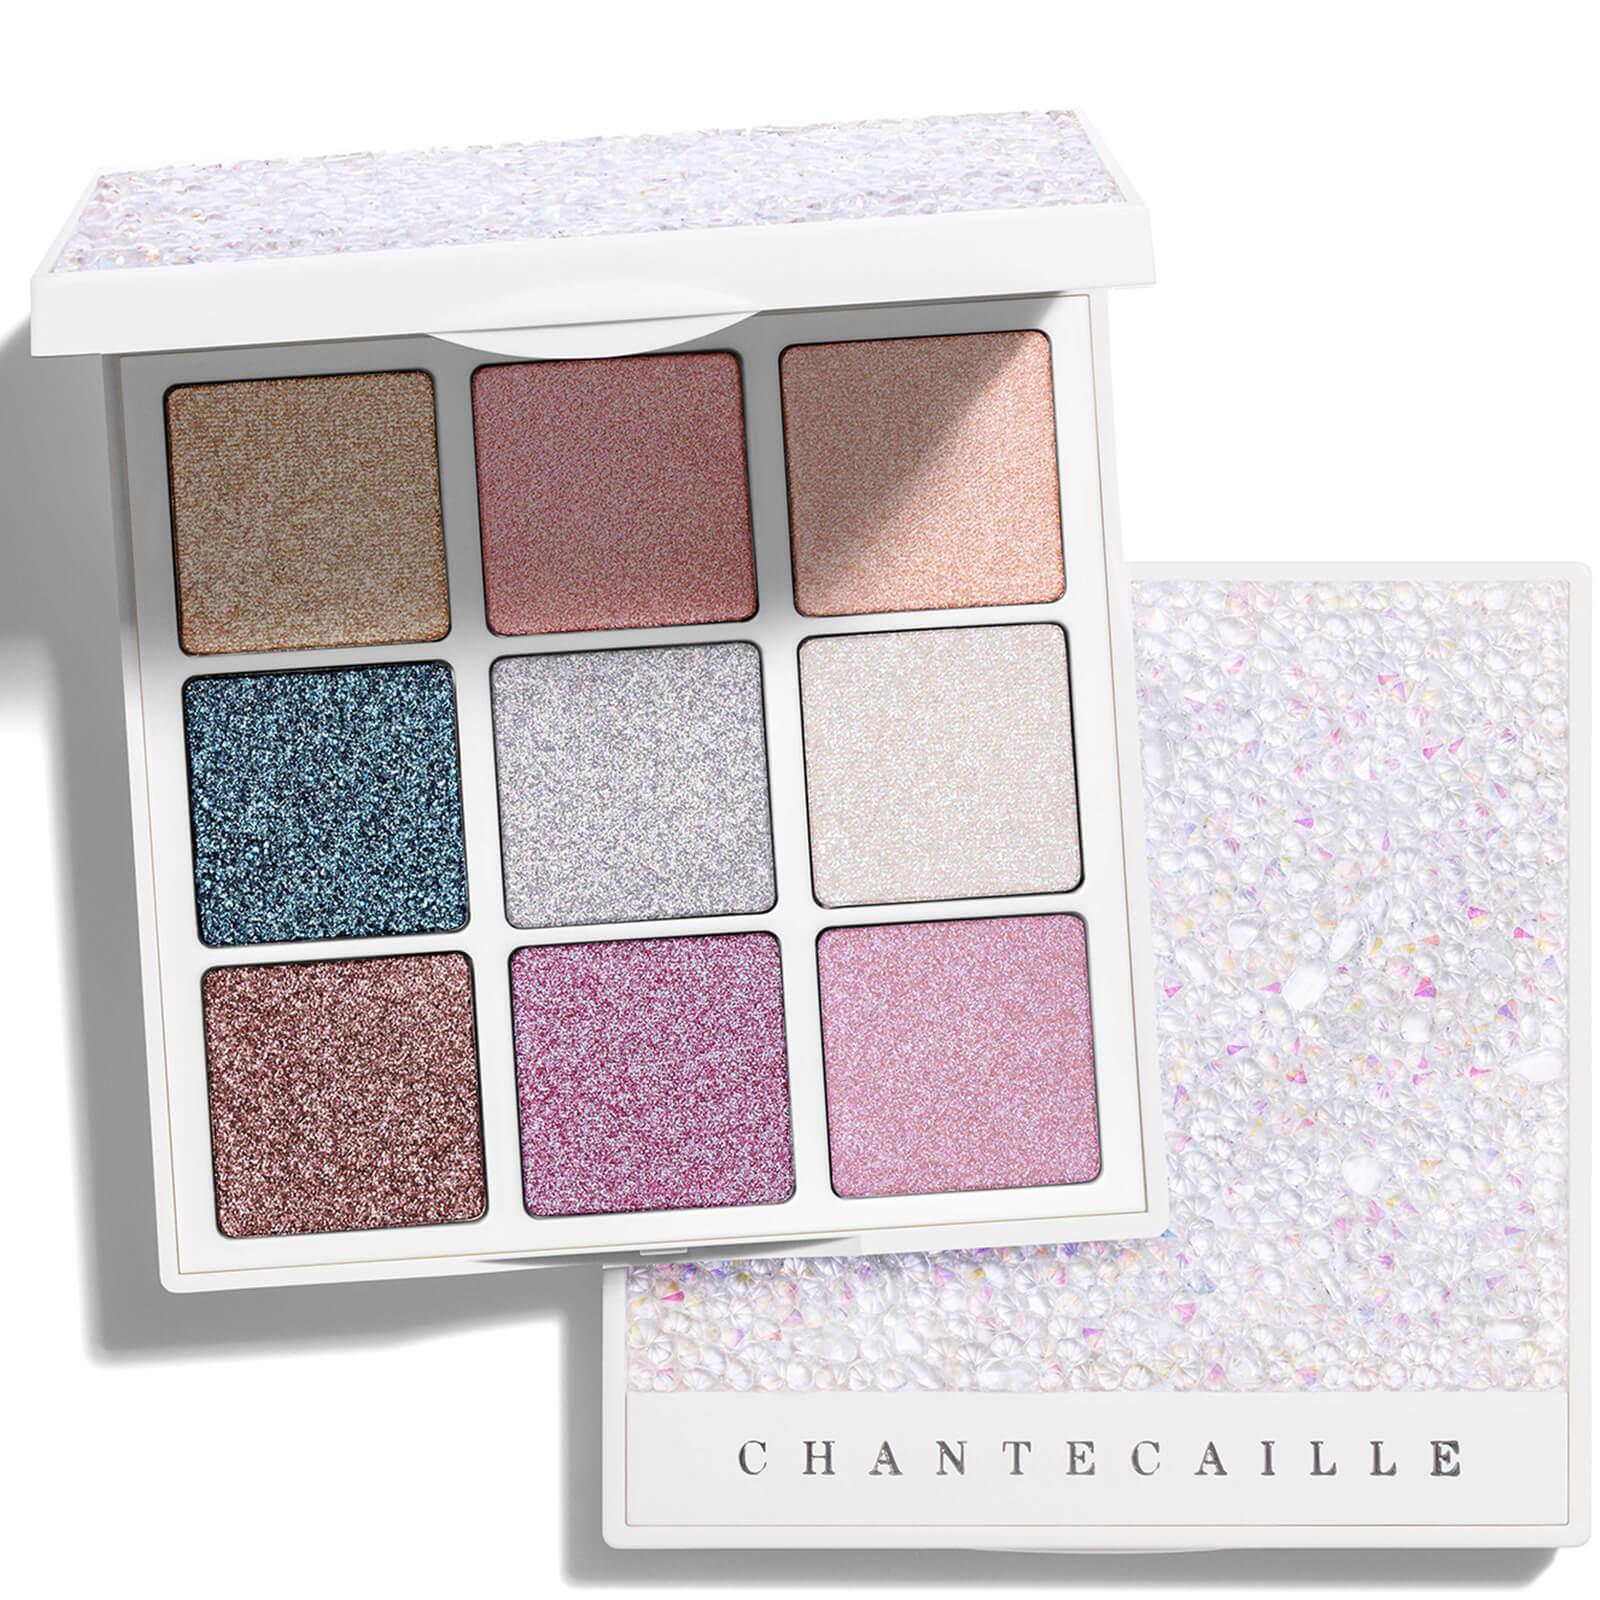 Chantecaille香缇卡 Polar 9色眼影盘